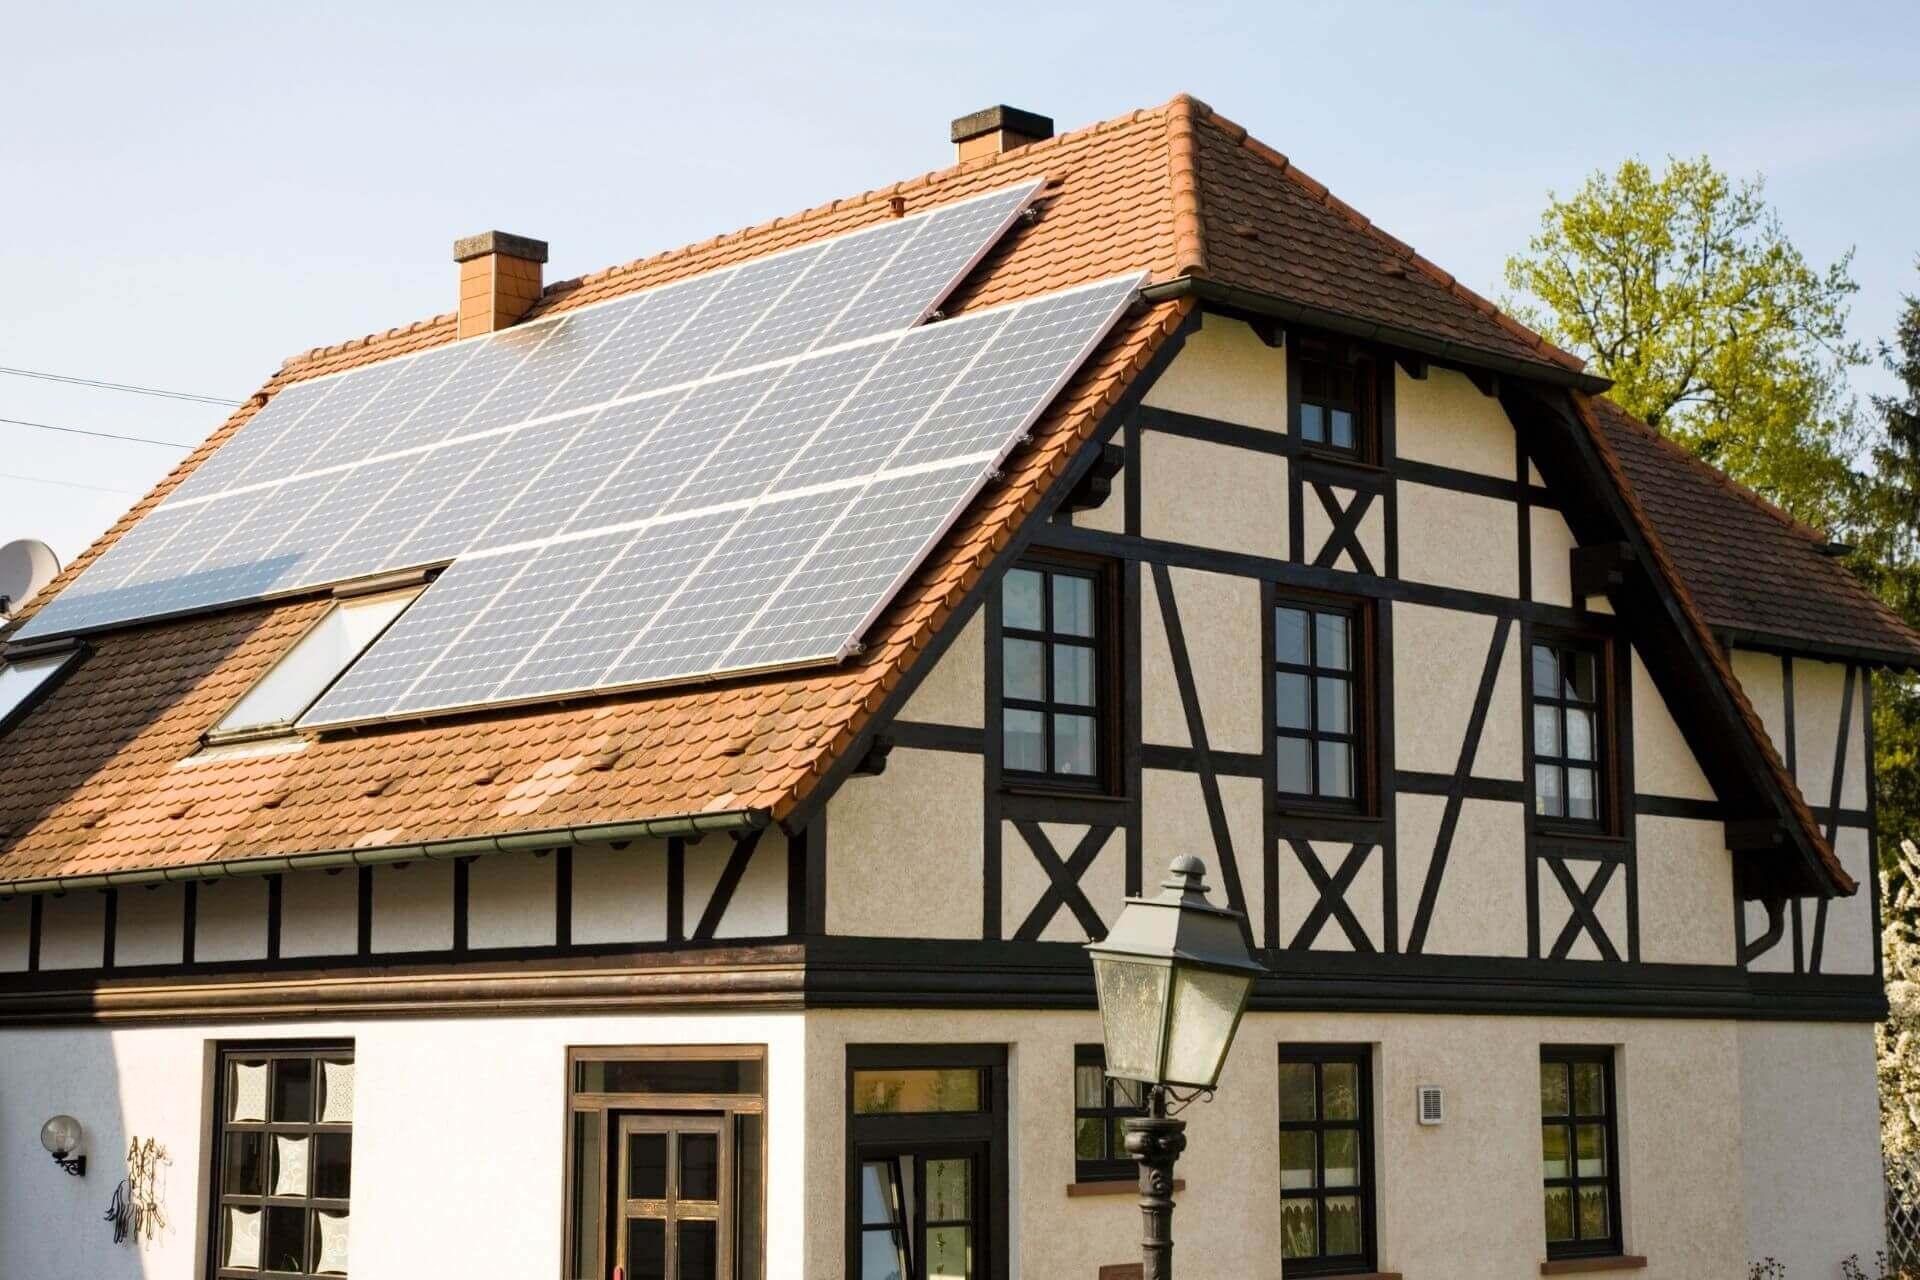 solar panels uk homes 1920x1280